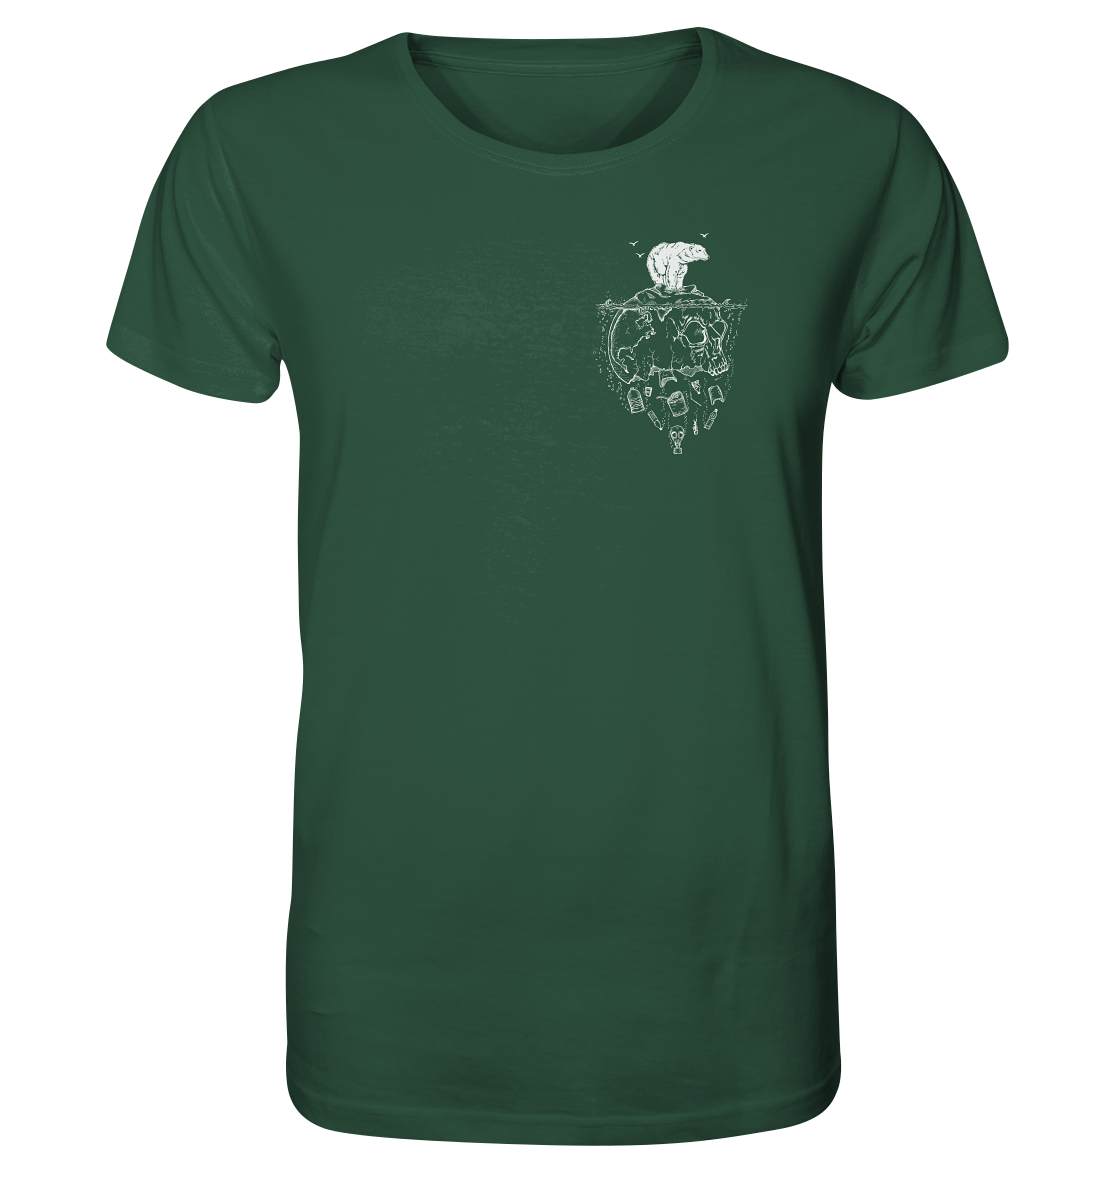 front-organic-shirt-2f5240-1116x-15.png